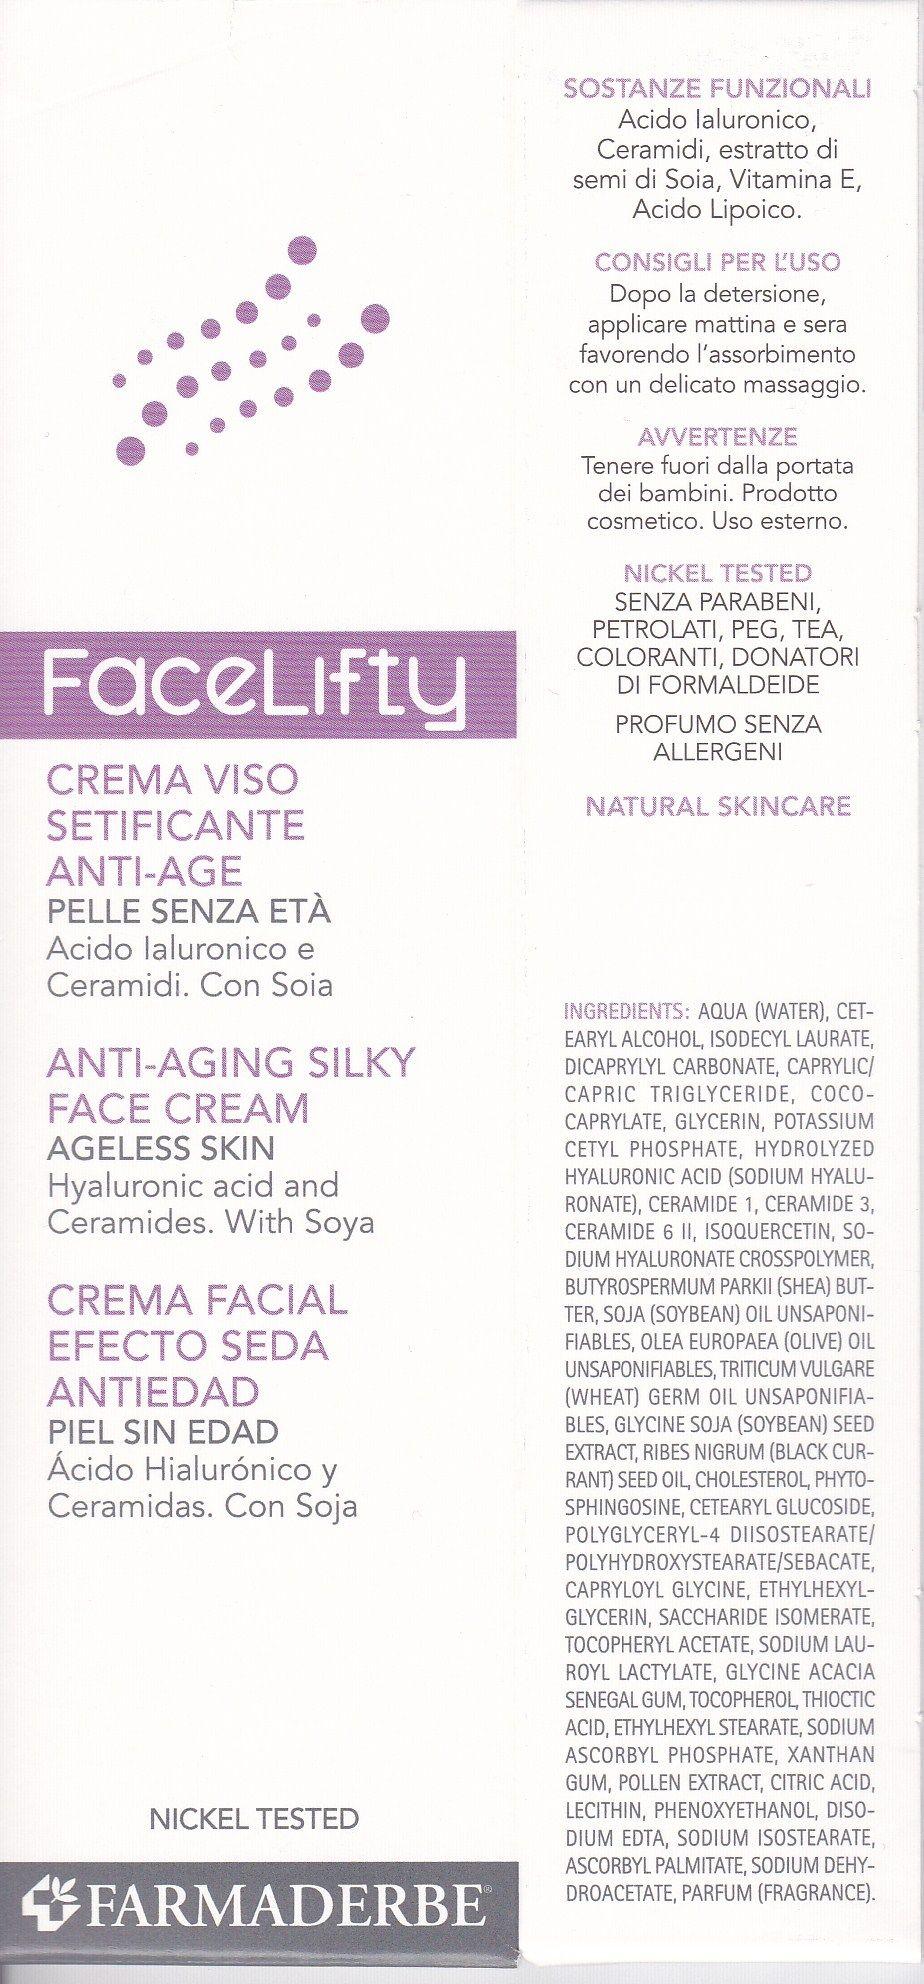 FARMADERBE  FaceLifthy  Crema